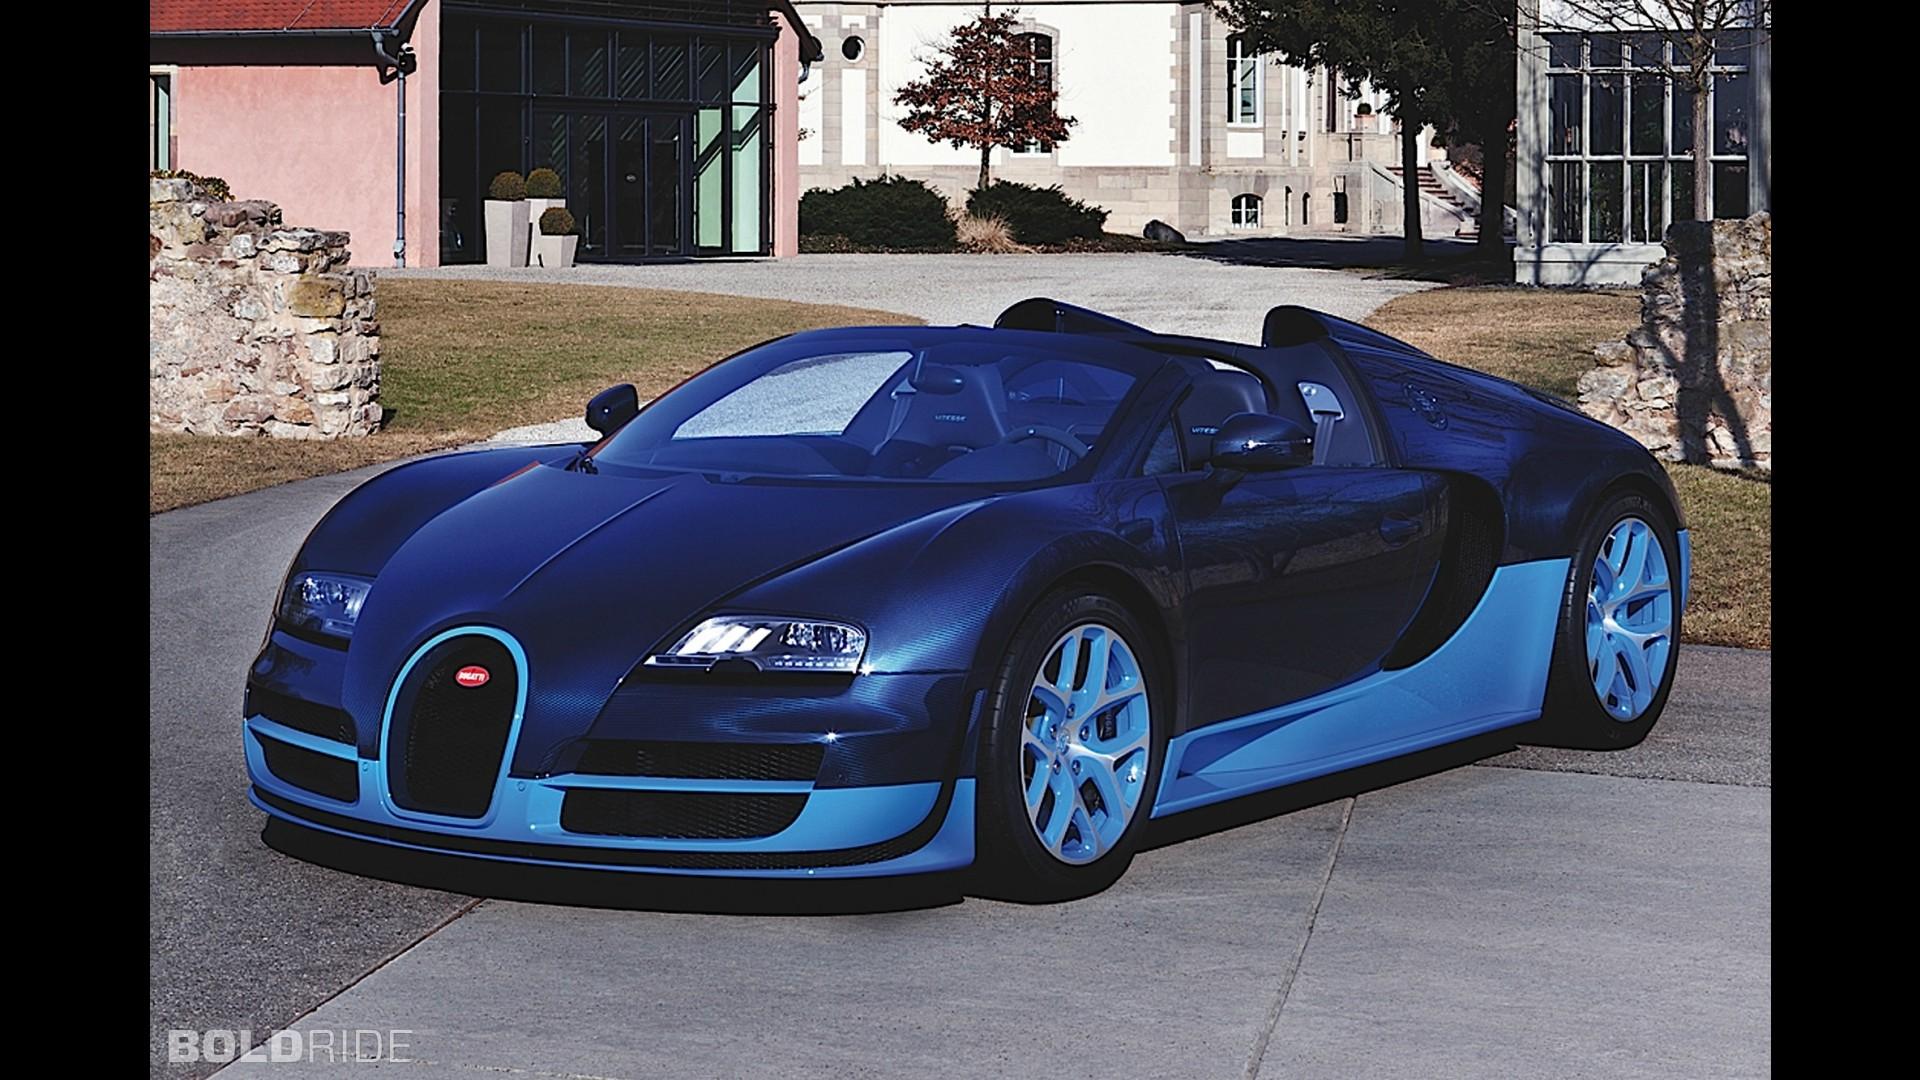 bugatti-veyron-grand-sport-vitesse Fascinating Bugatti Veyron Grand Sport Vitesse Convertible Cars Trend